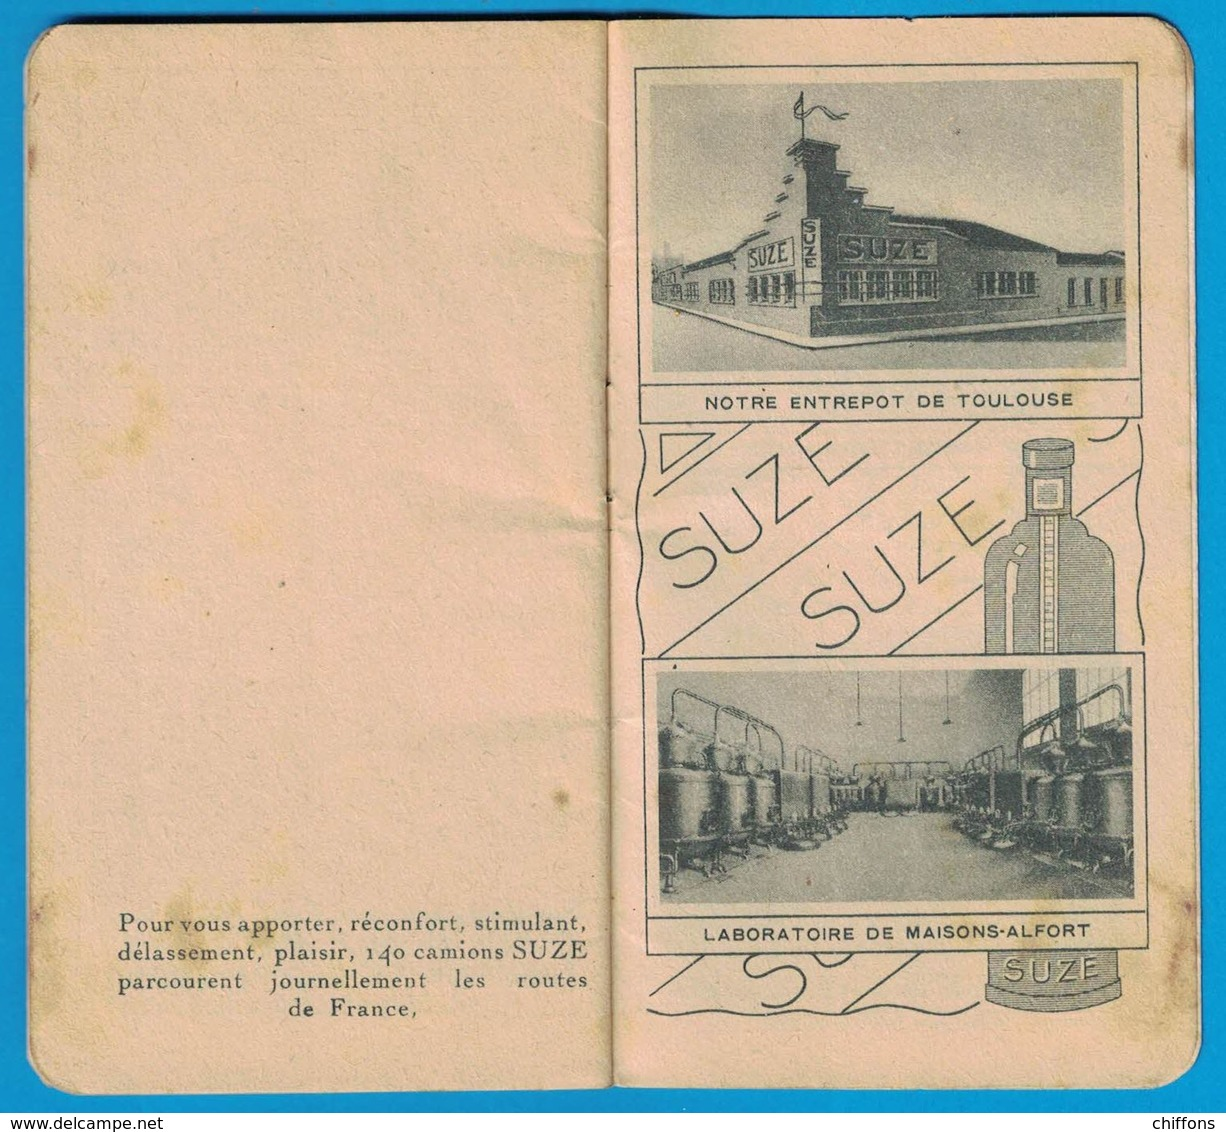 CARNET APERITIF A LA GENTIANE SUZE L'AMIE DE L'ESTOMAC CALENDRIER 1940 - Publicités